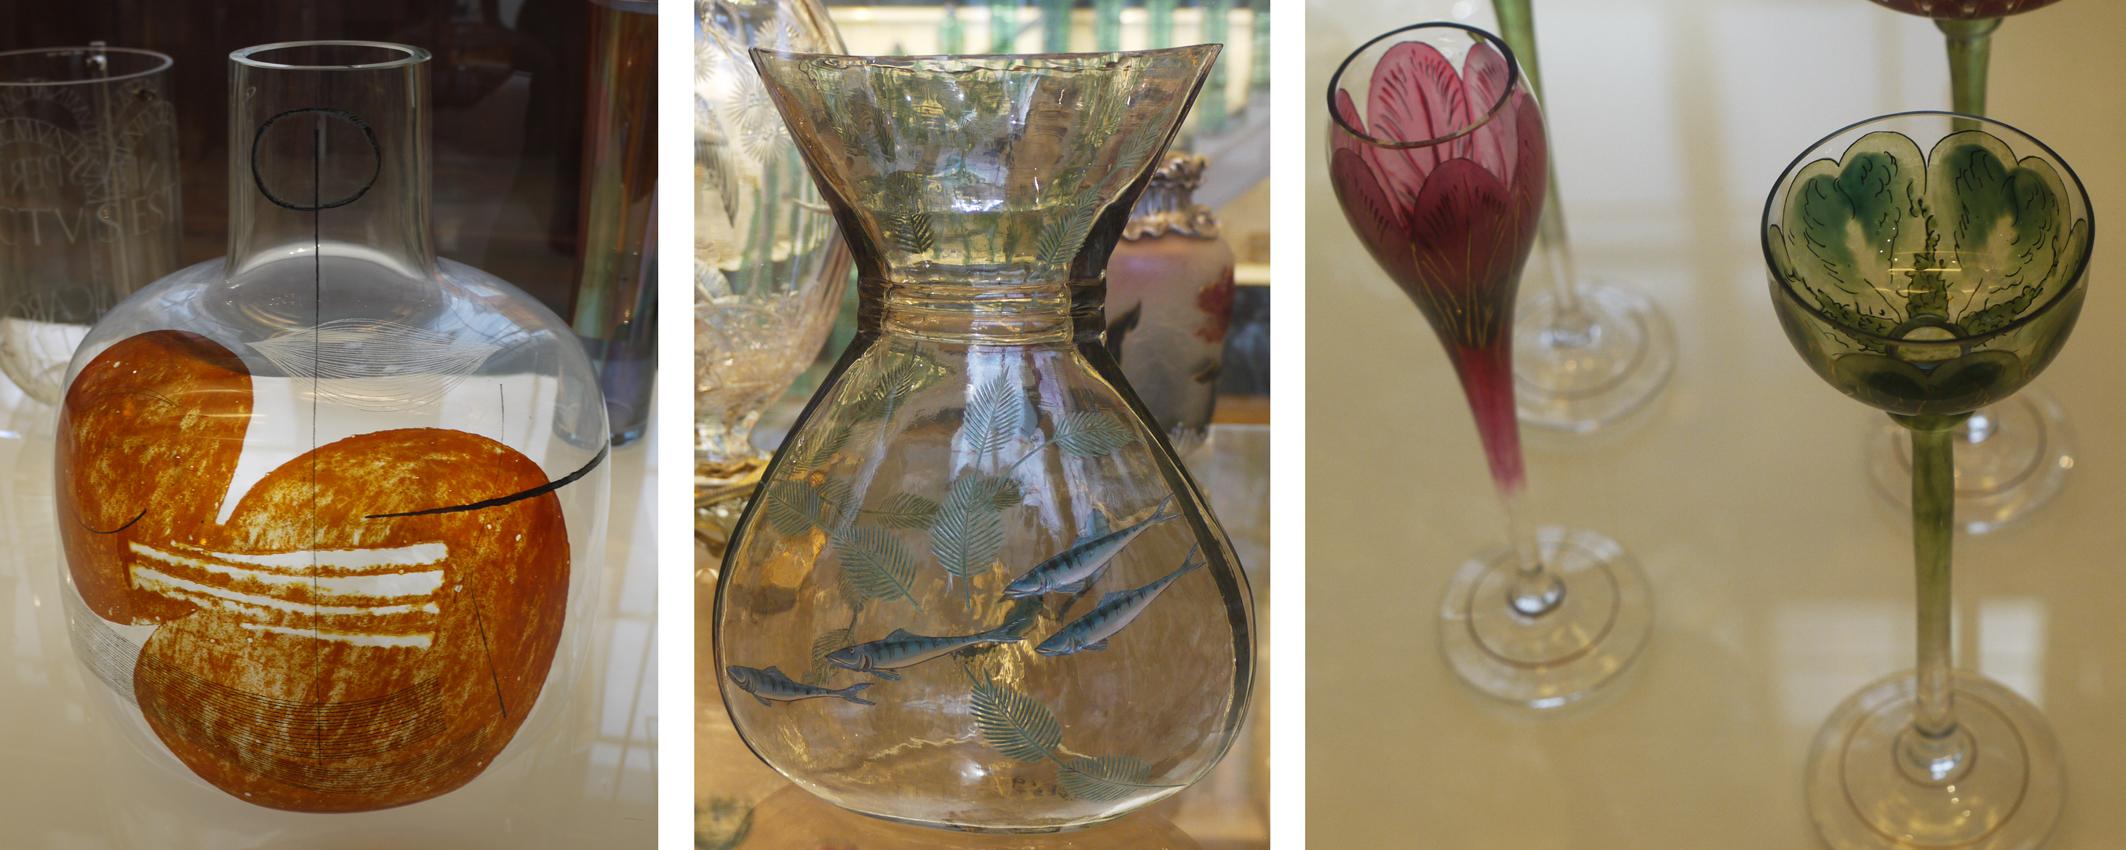 Enamelled glass vessels in the V&A: by Karel Vanura 1959, Francois Eugene Rousseau 1878, Ludwig Sutterlin 1904.